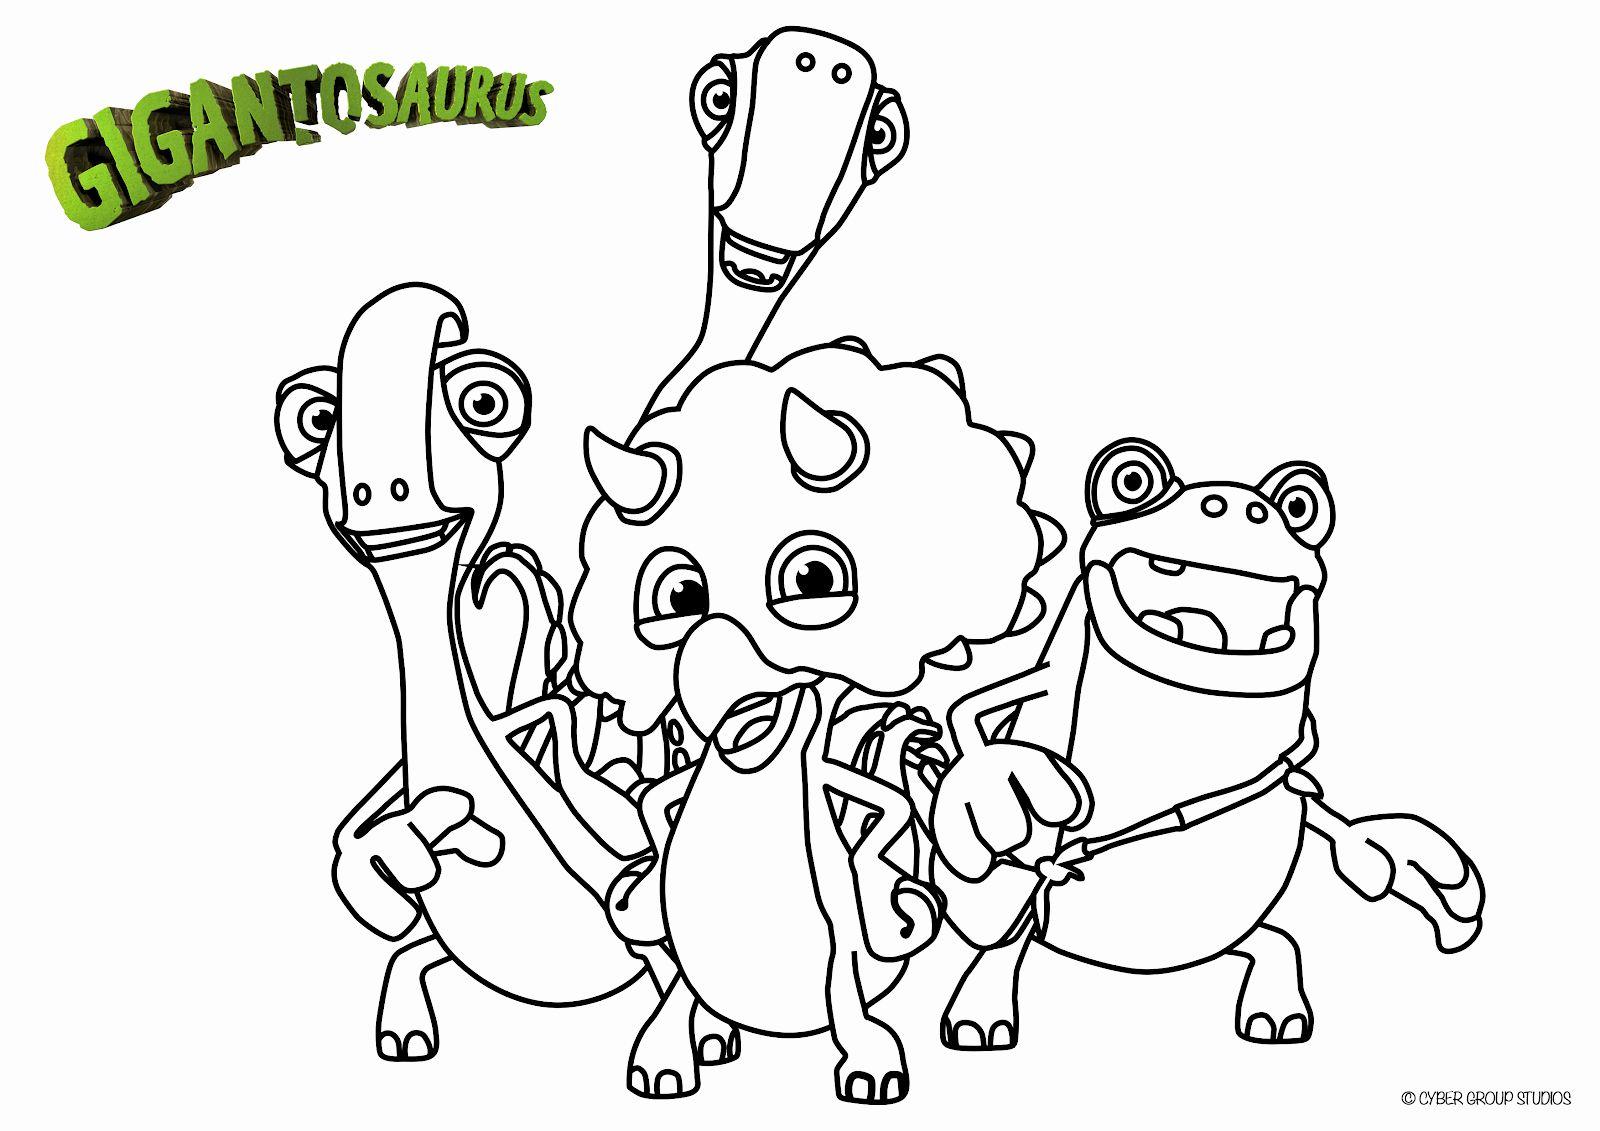 Disney Jr Printable Coloring Pages Awesome Gigantosaurus ...